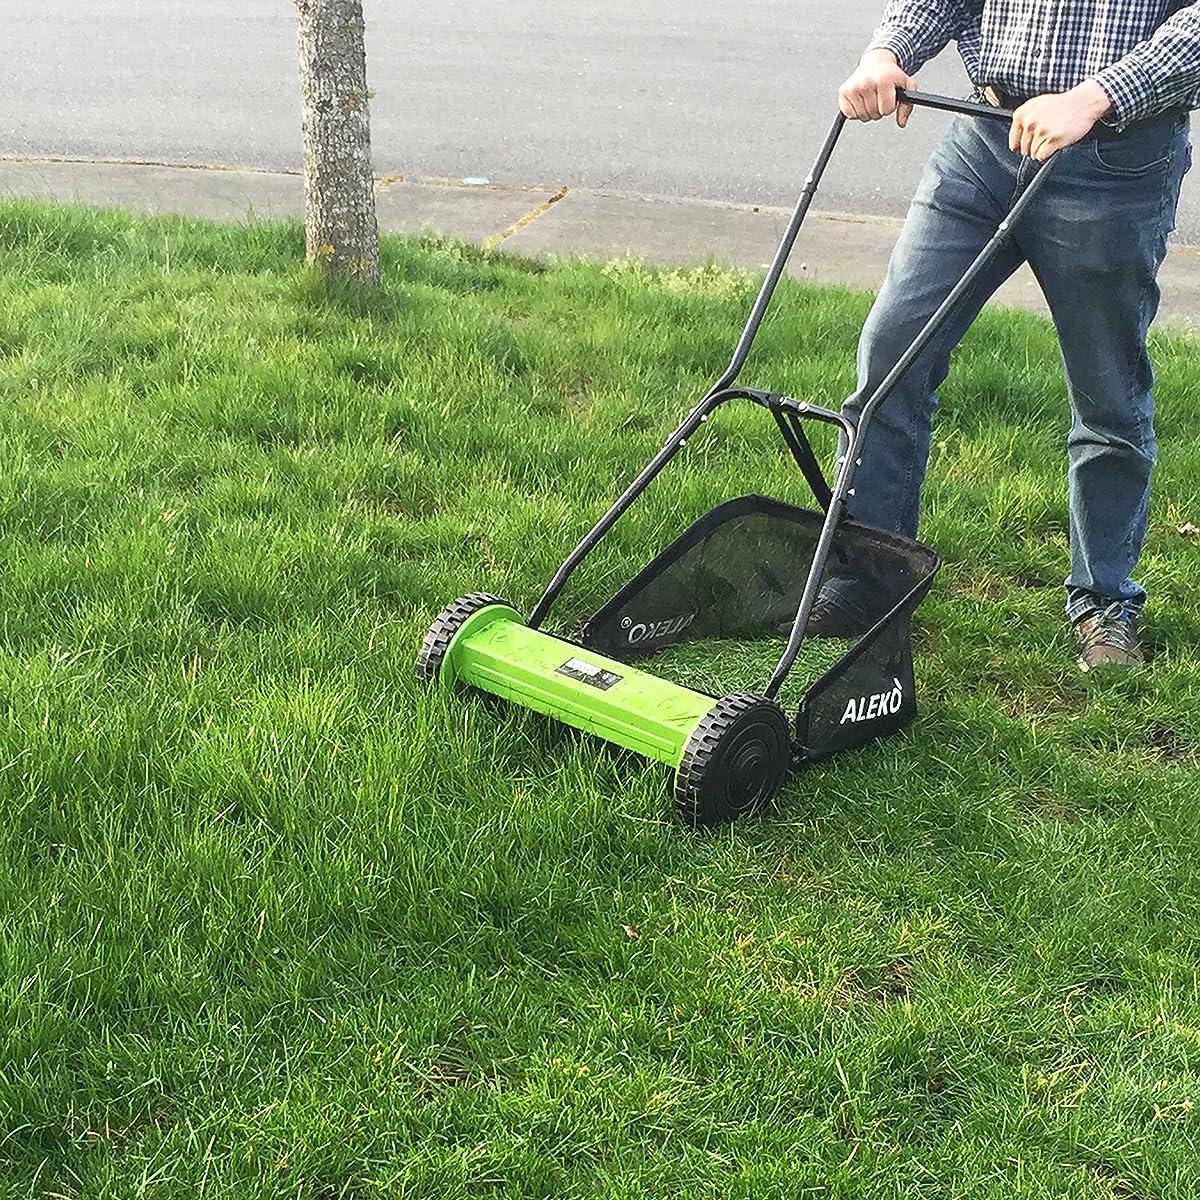 ALEKO GHPM16 5-Blade 16 Inch Hand Push Lawn Mower Adjustable Grass Cutting Height